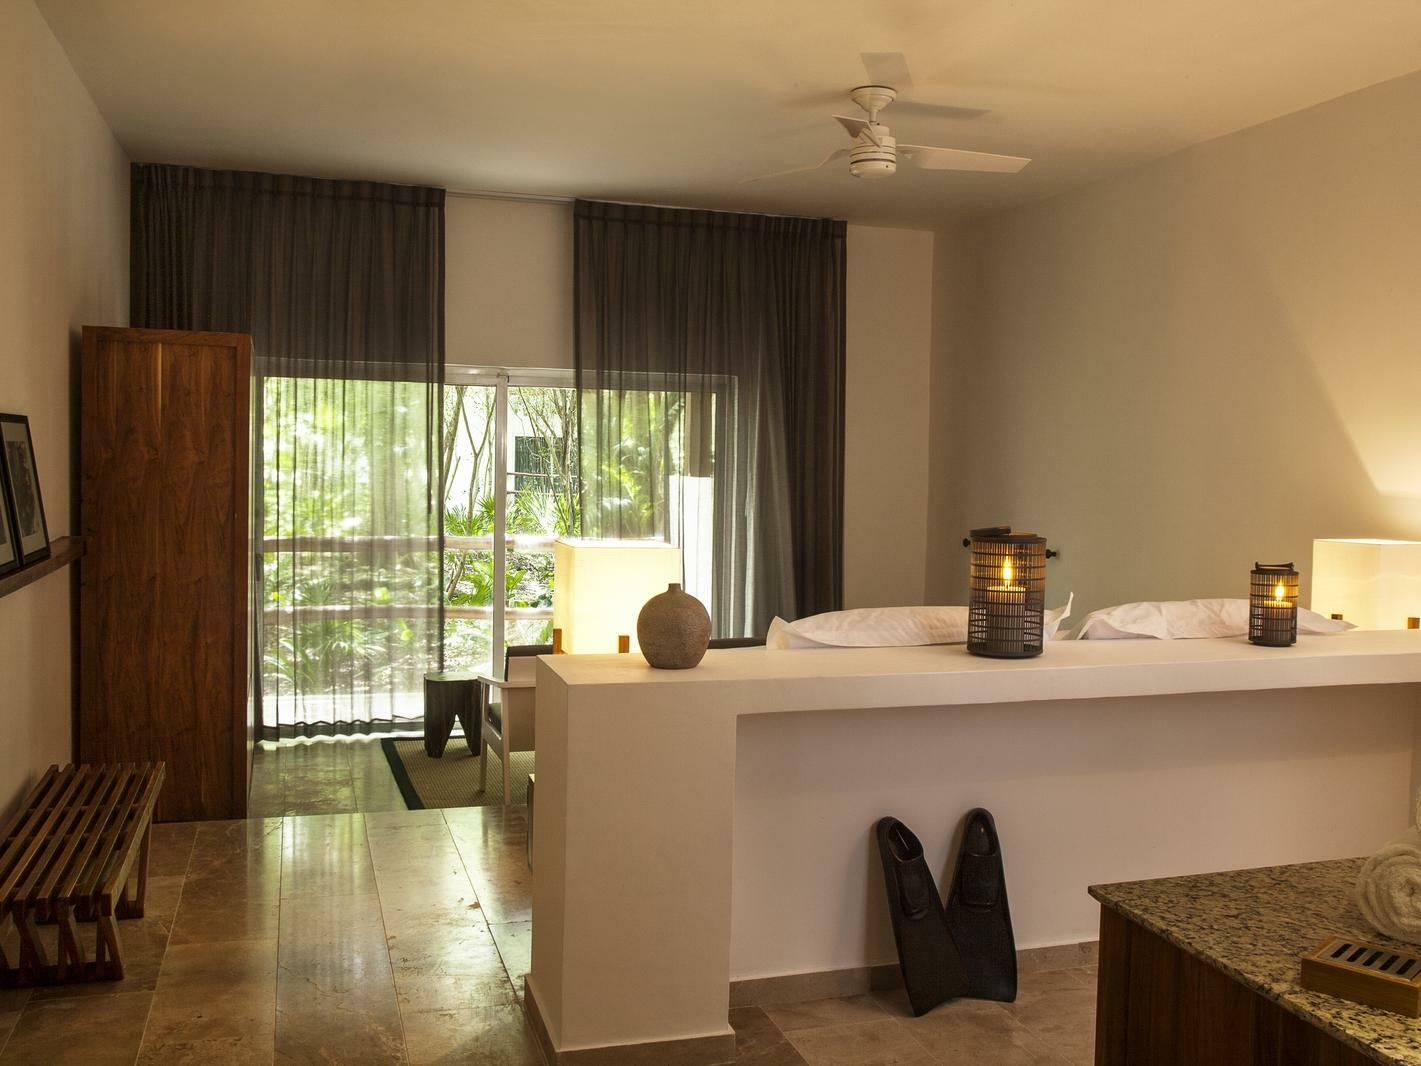 Casita Stand alone 1 king at Hotel the Explorean Cozumel